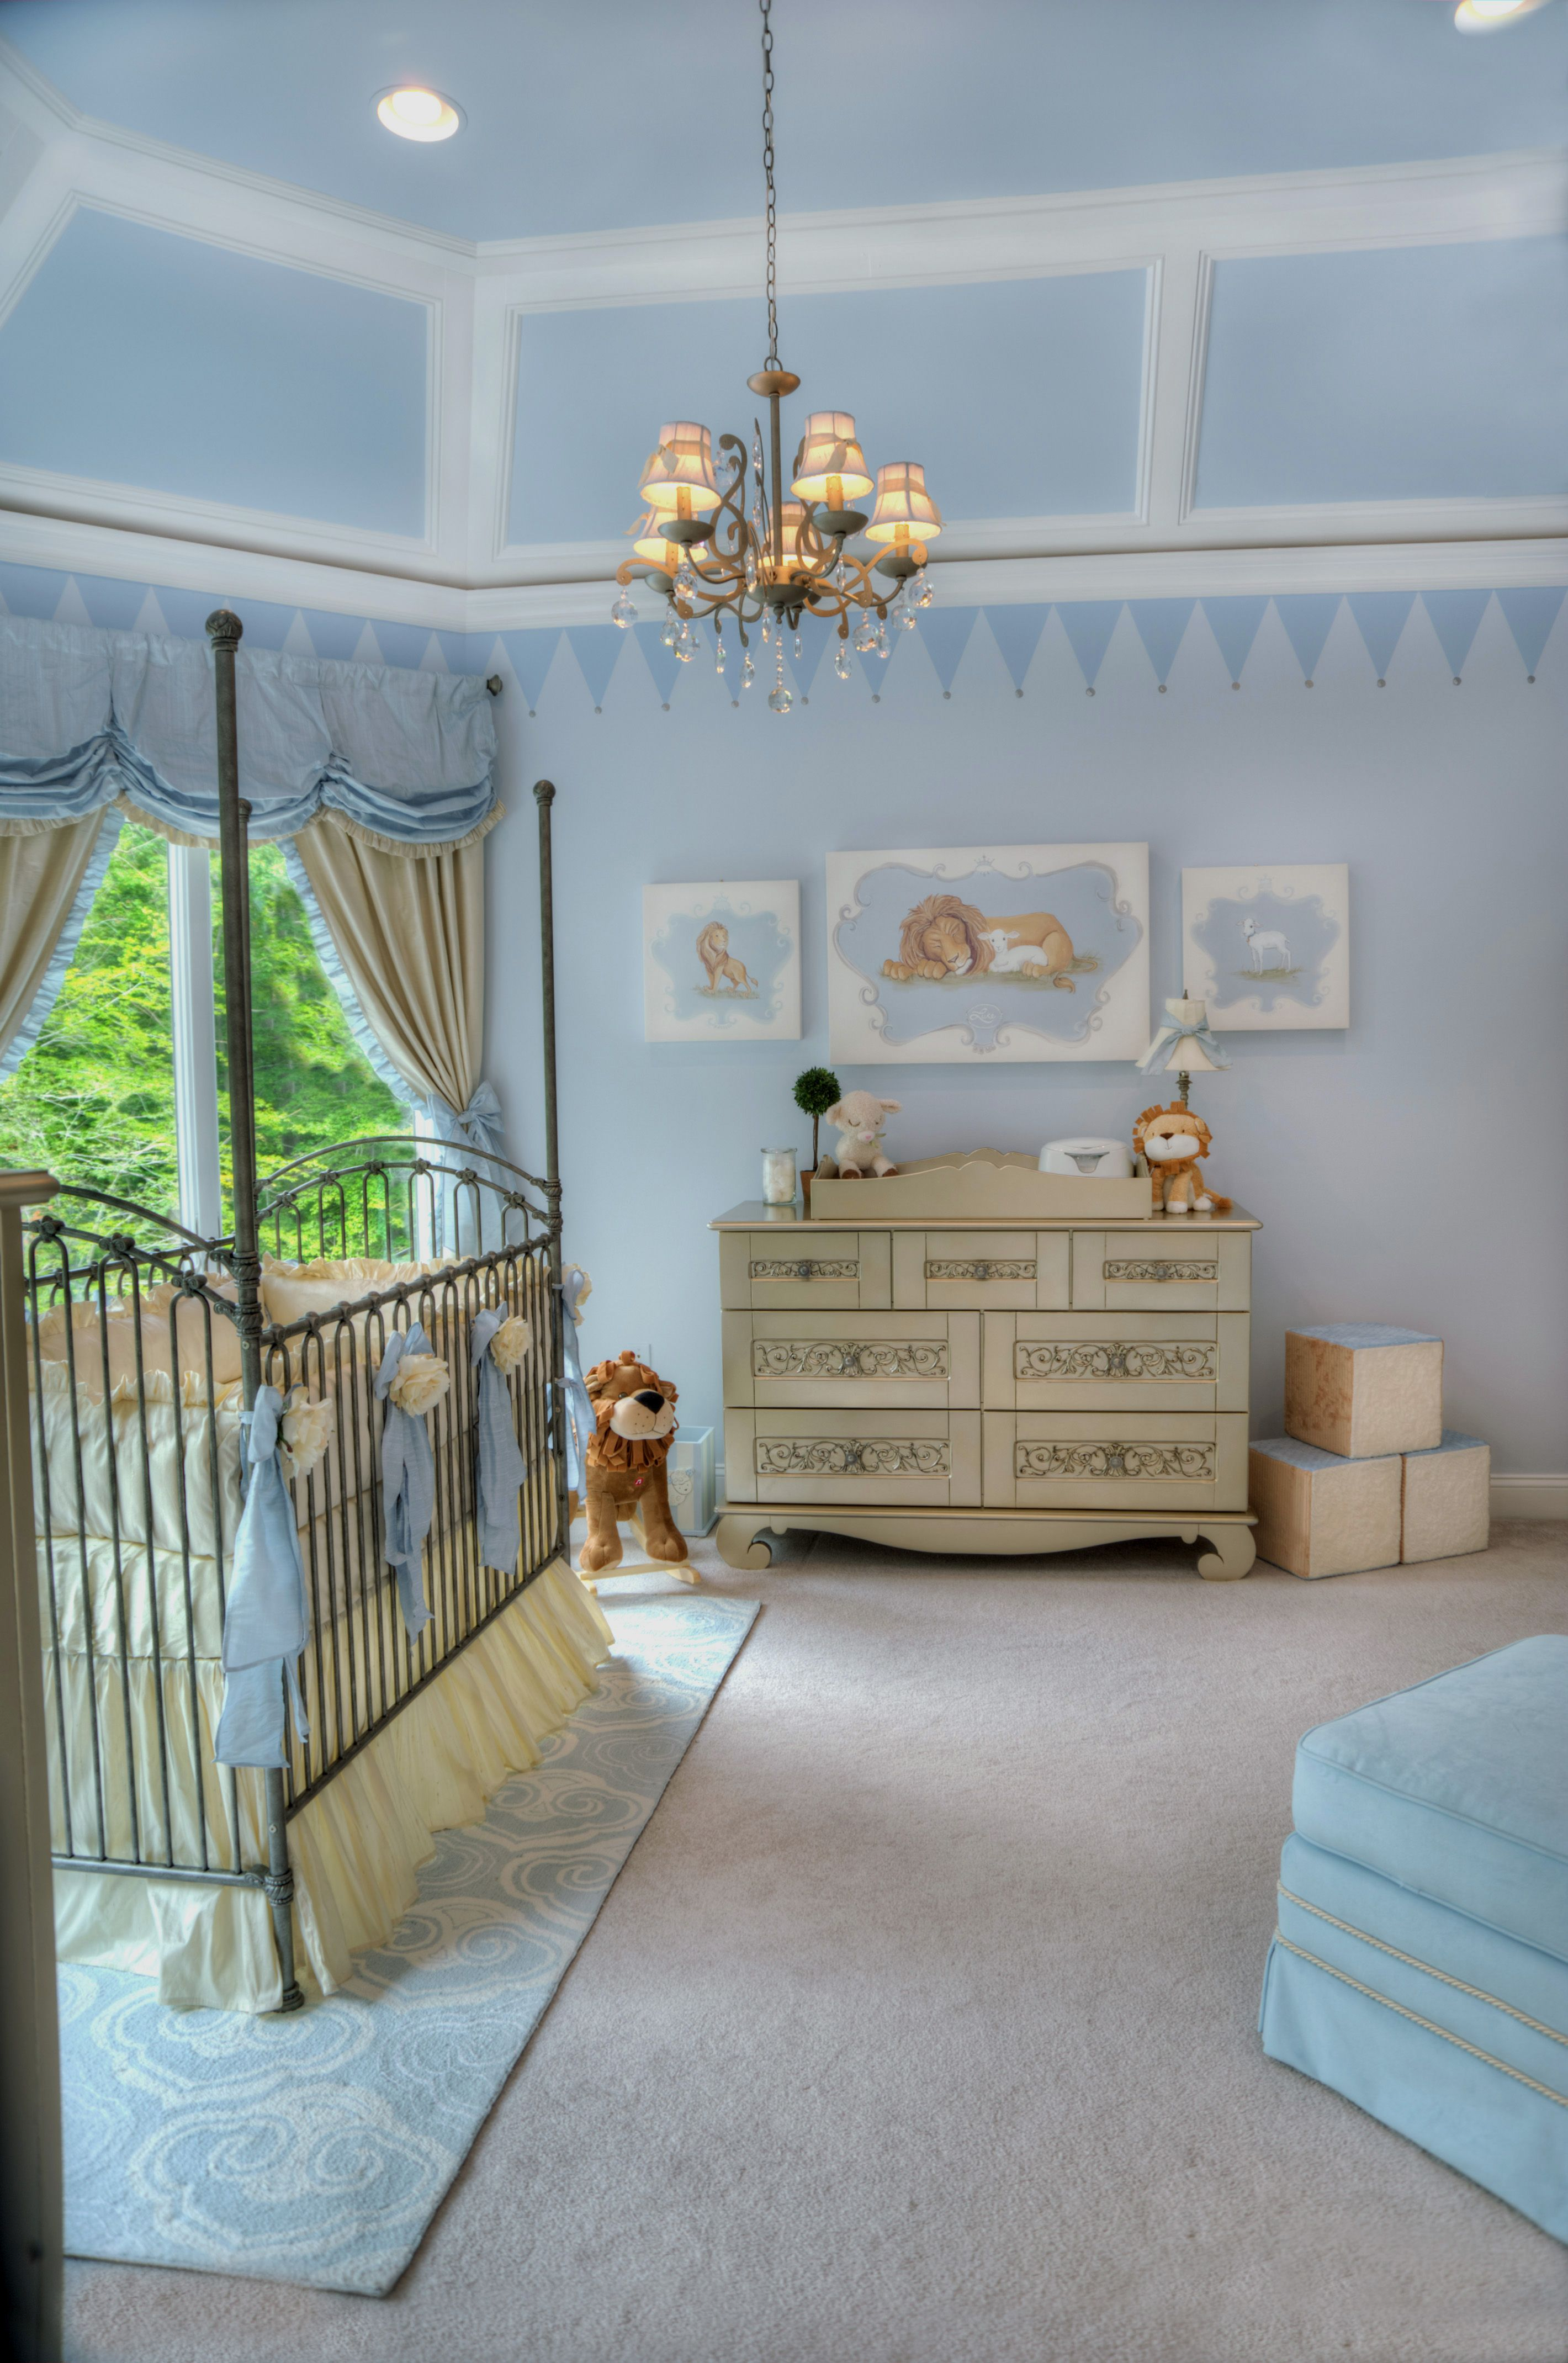 Baby cribs richmond va - Royal Prince Nursery Prince Baby Nursery Design Ideas Fairytale Room By Celebrity Nursery Designer